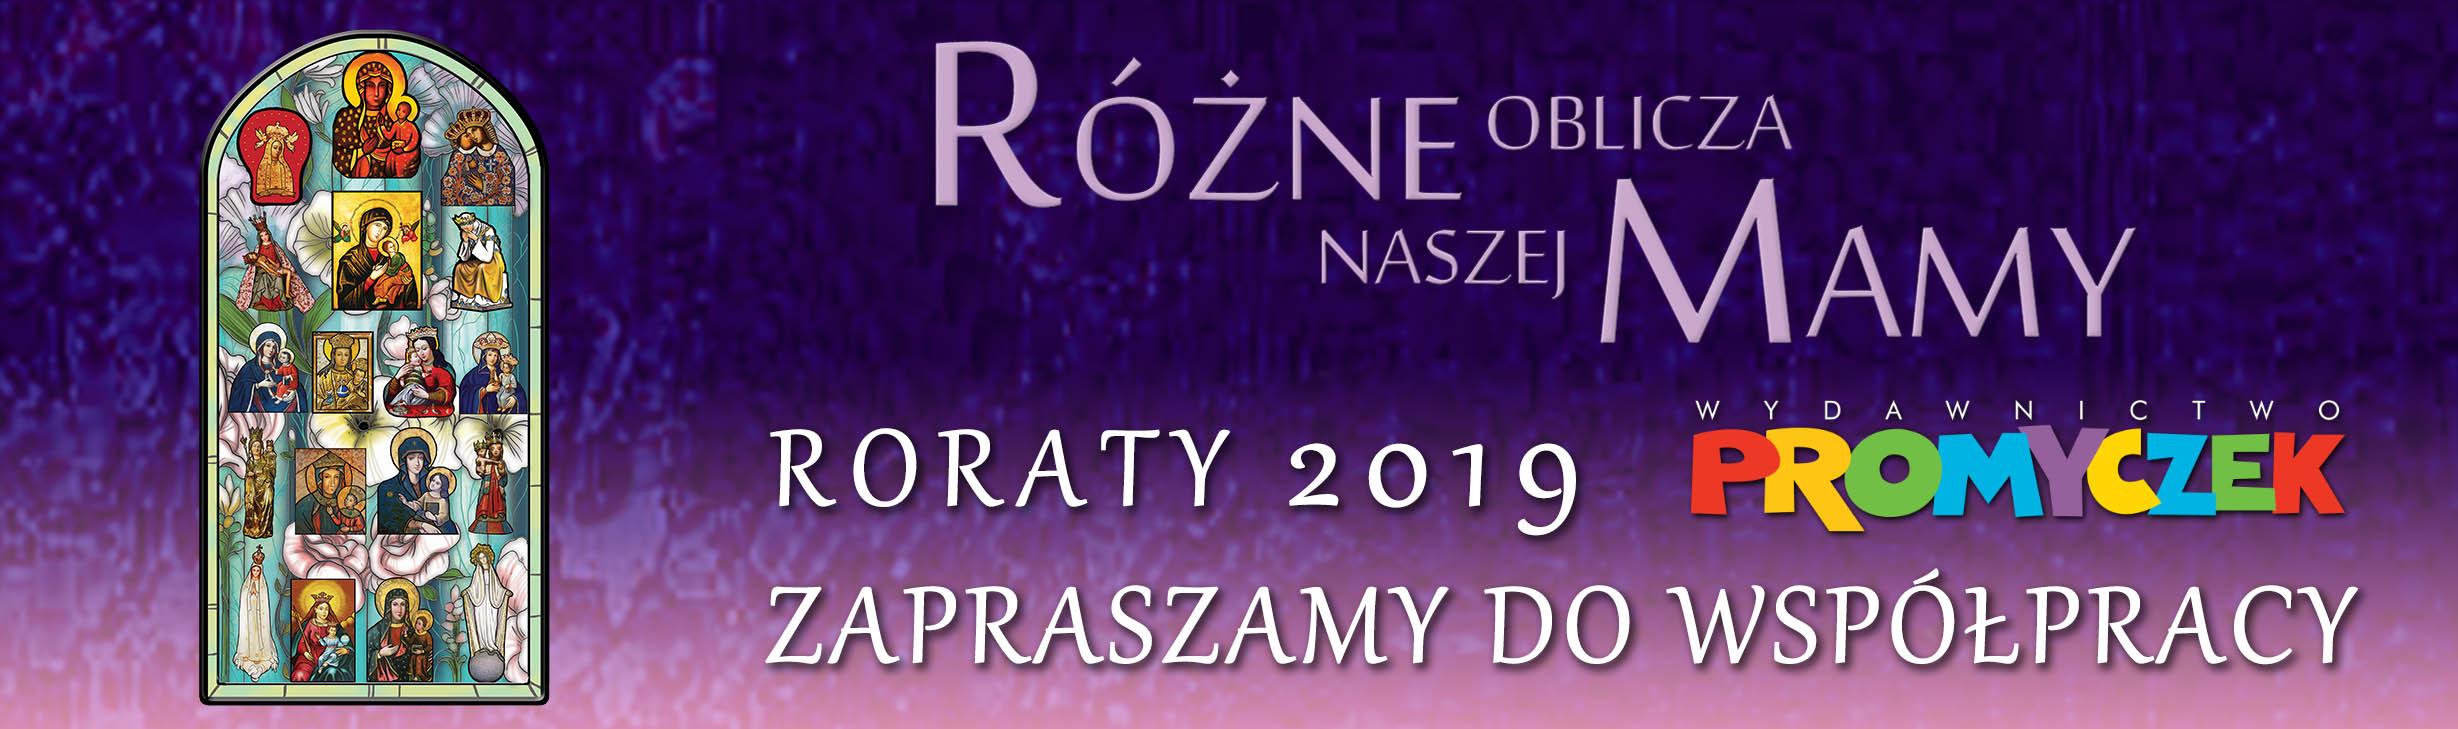 Roraty 2019